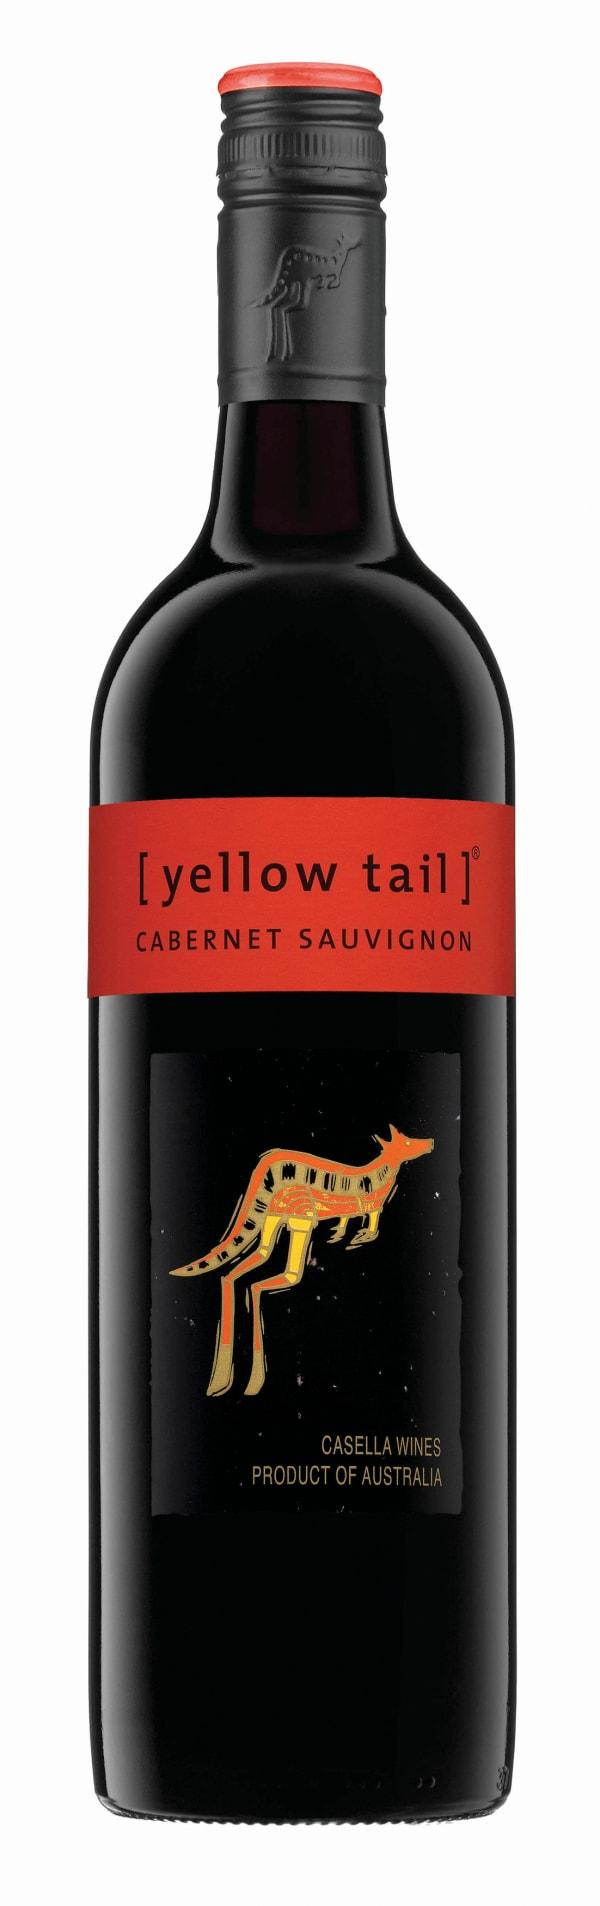 Yellow Tail Cabernet Sauvignon 2017